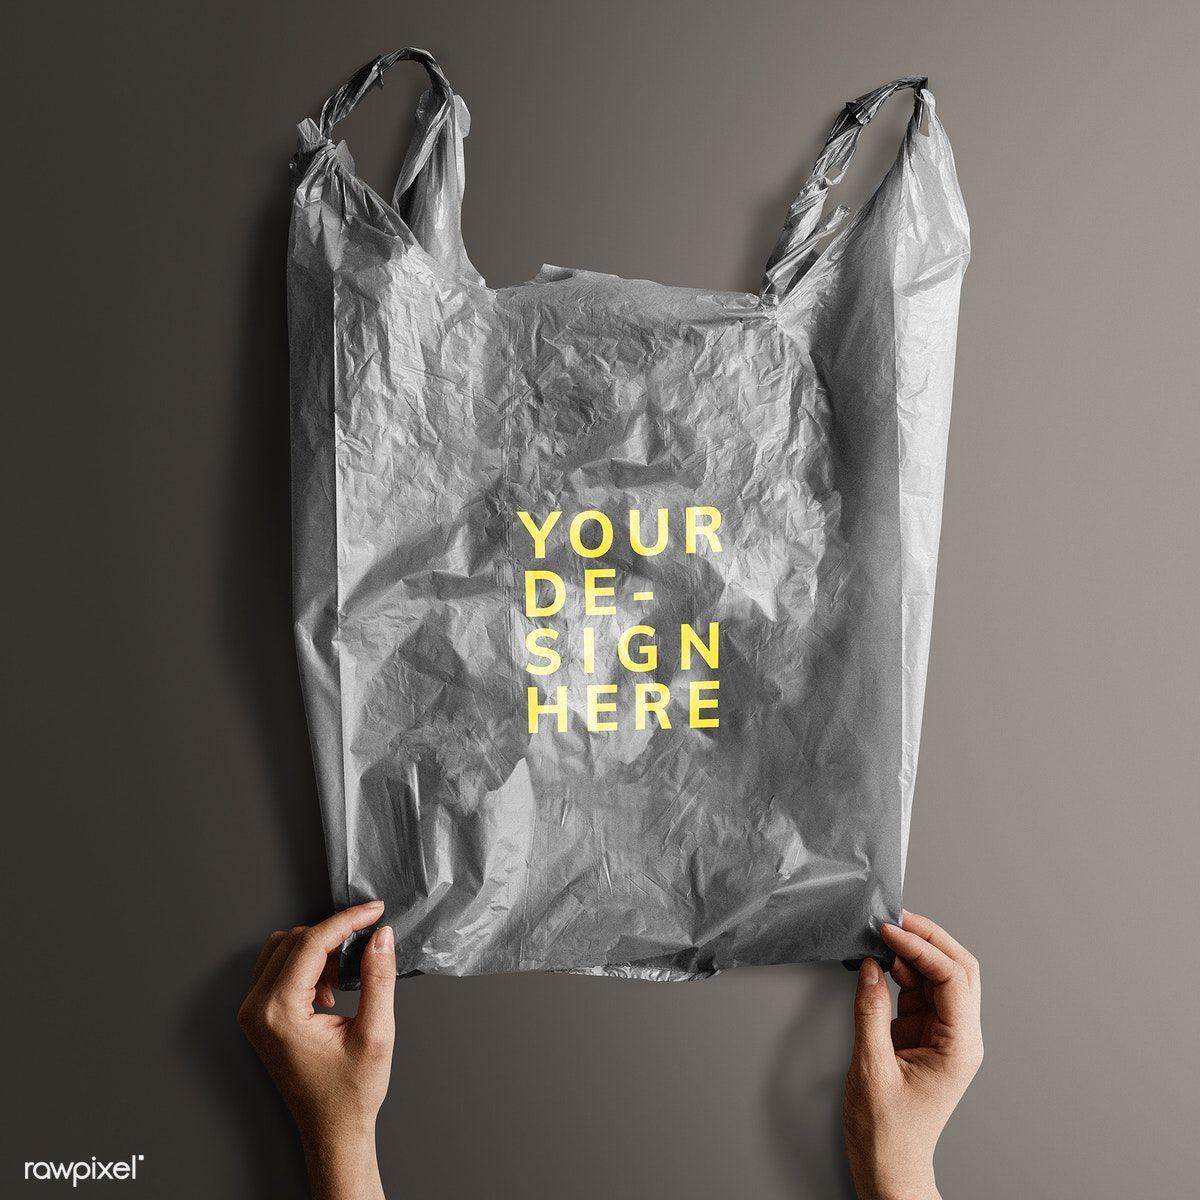 Download Download Premium Psd Of Gray Your Design Here Plastic Bag Mockup 1213789 Bag Mockup Plastic Bag Design Graphic Design Mockup